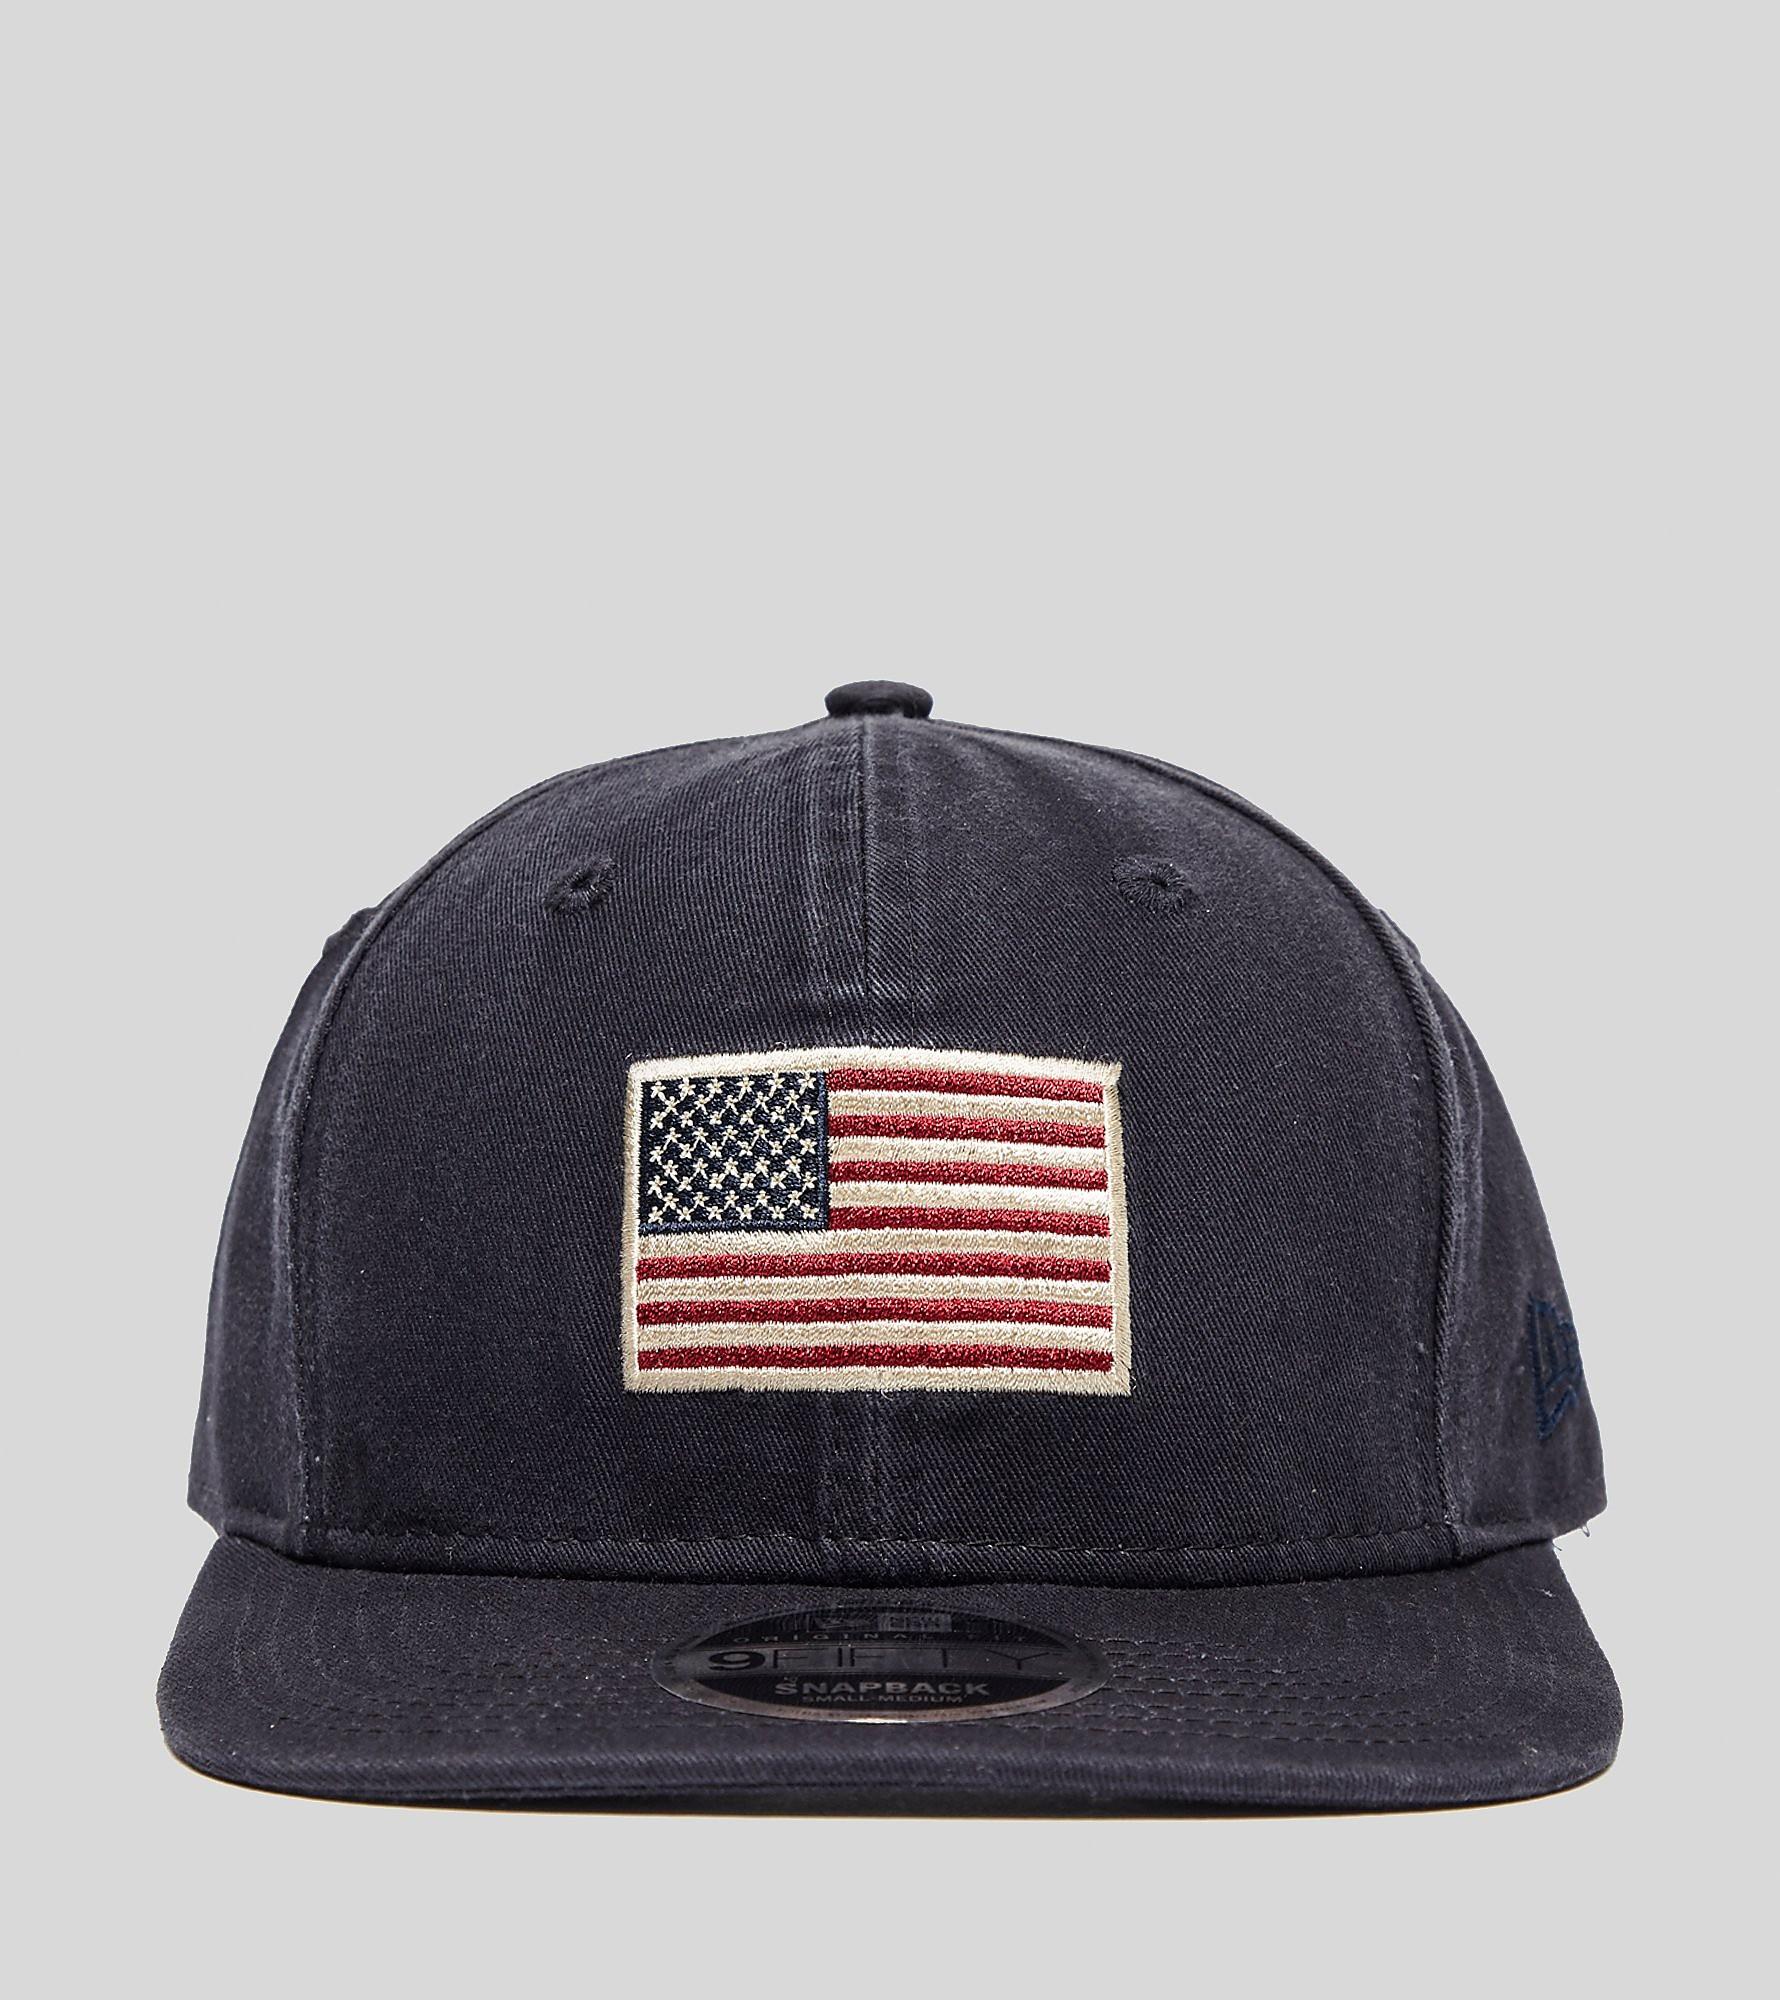 New Era 9FIFTY USA Flag